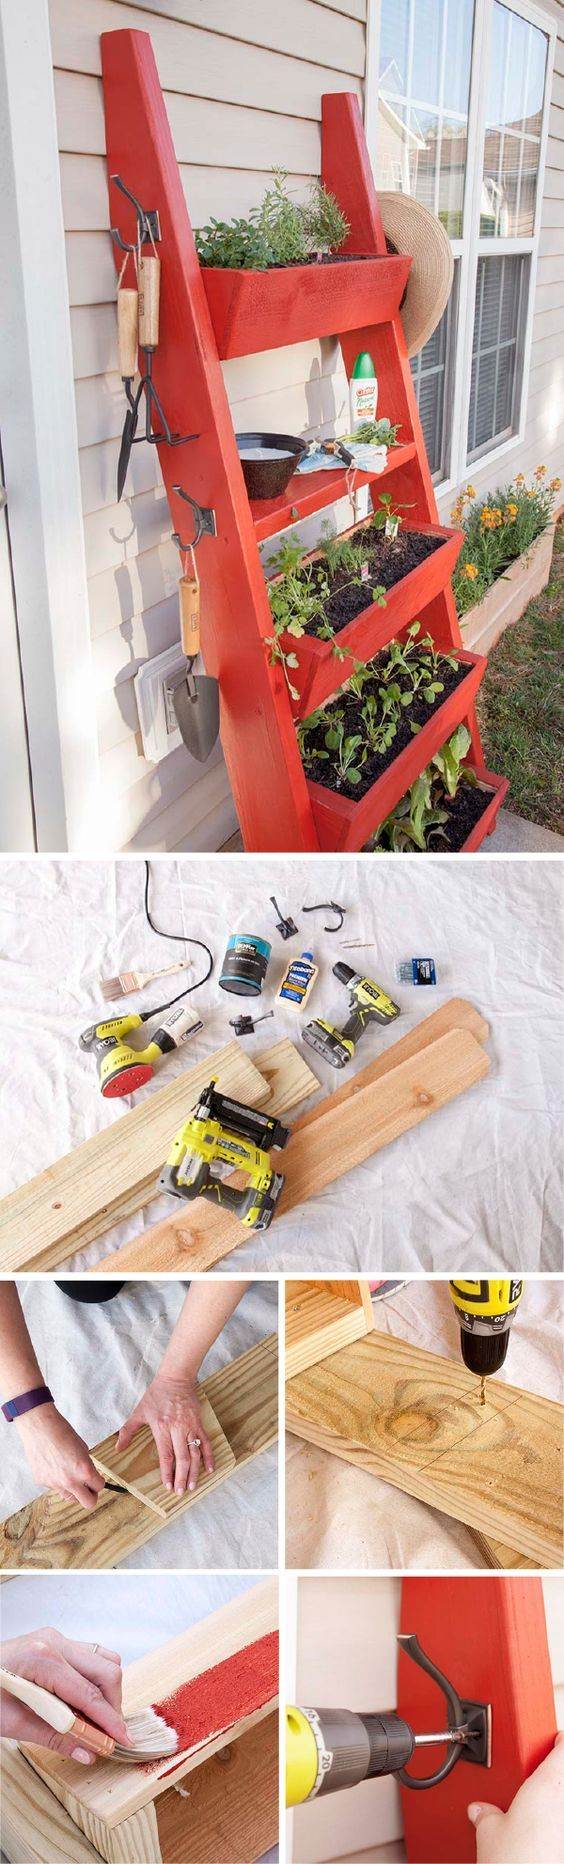 DIY Planter Box Ladder The Home Depot Blog Diy